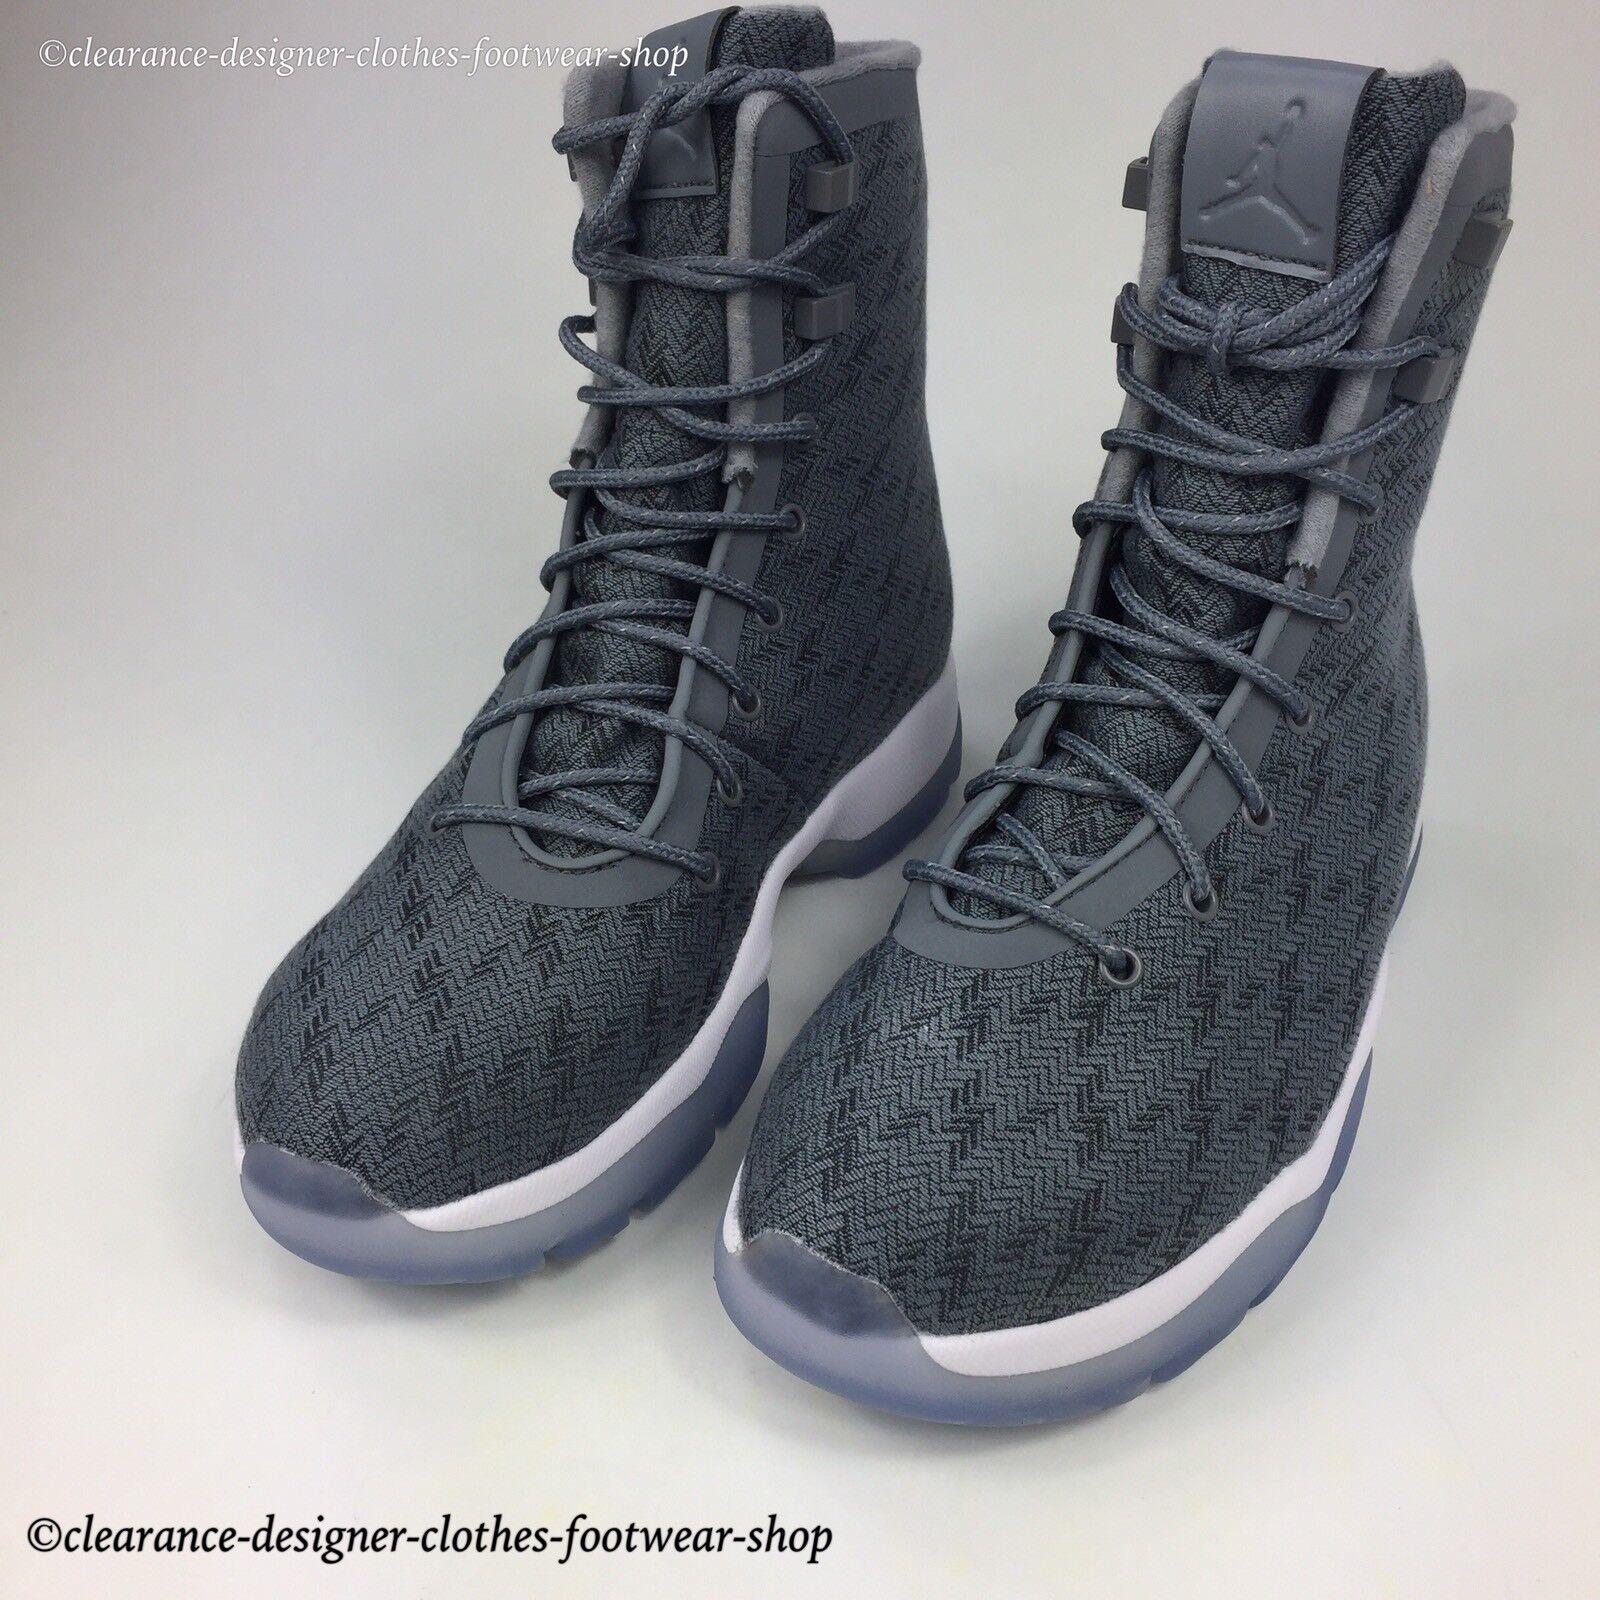 NIKE JORDAN FUTURE RETRO BOOT WATERPROOF COOL gris RETRO FUTURE TRAINERS Chaussures b17670